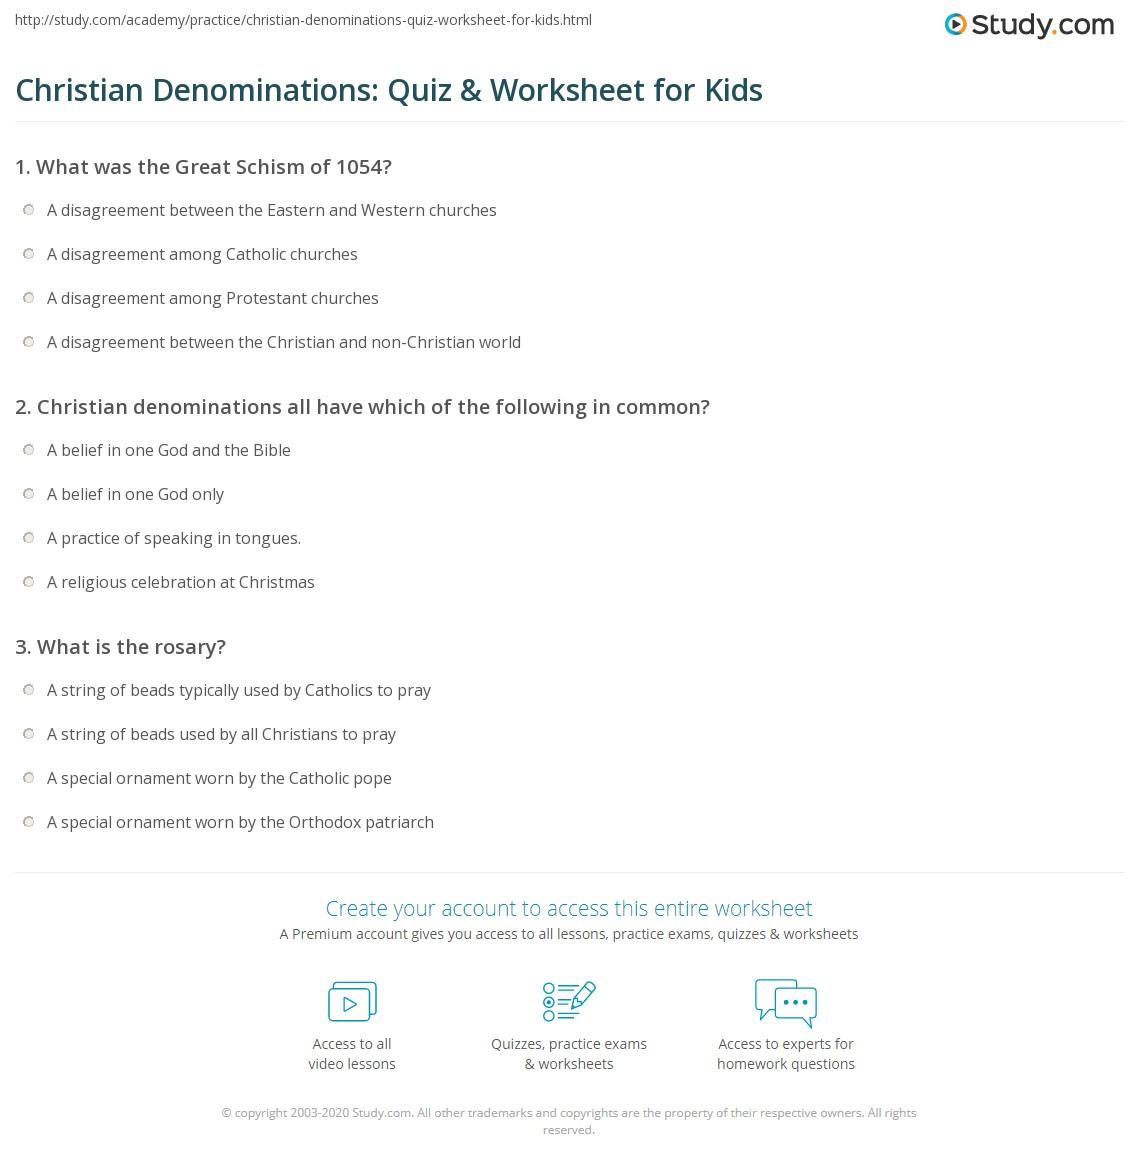 Christian Denominations Quiz Amp Worksheet For Kids